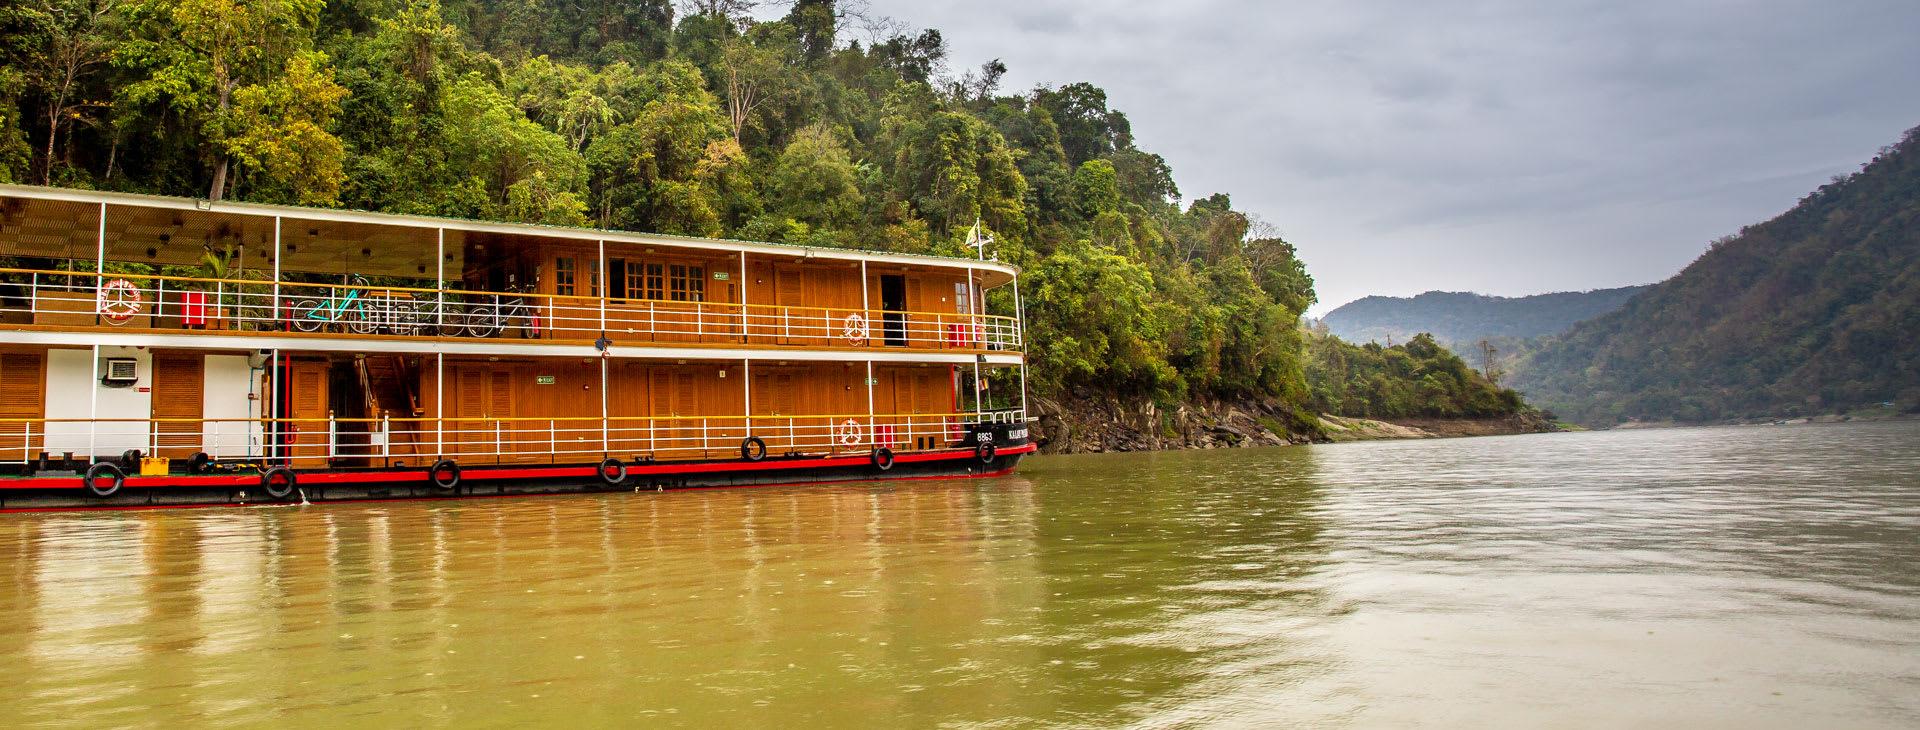 Kha Byoo on the river